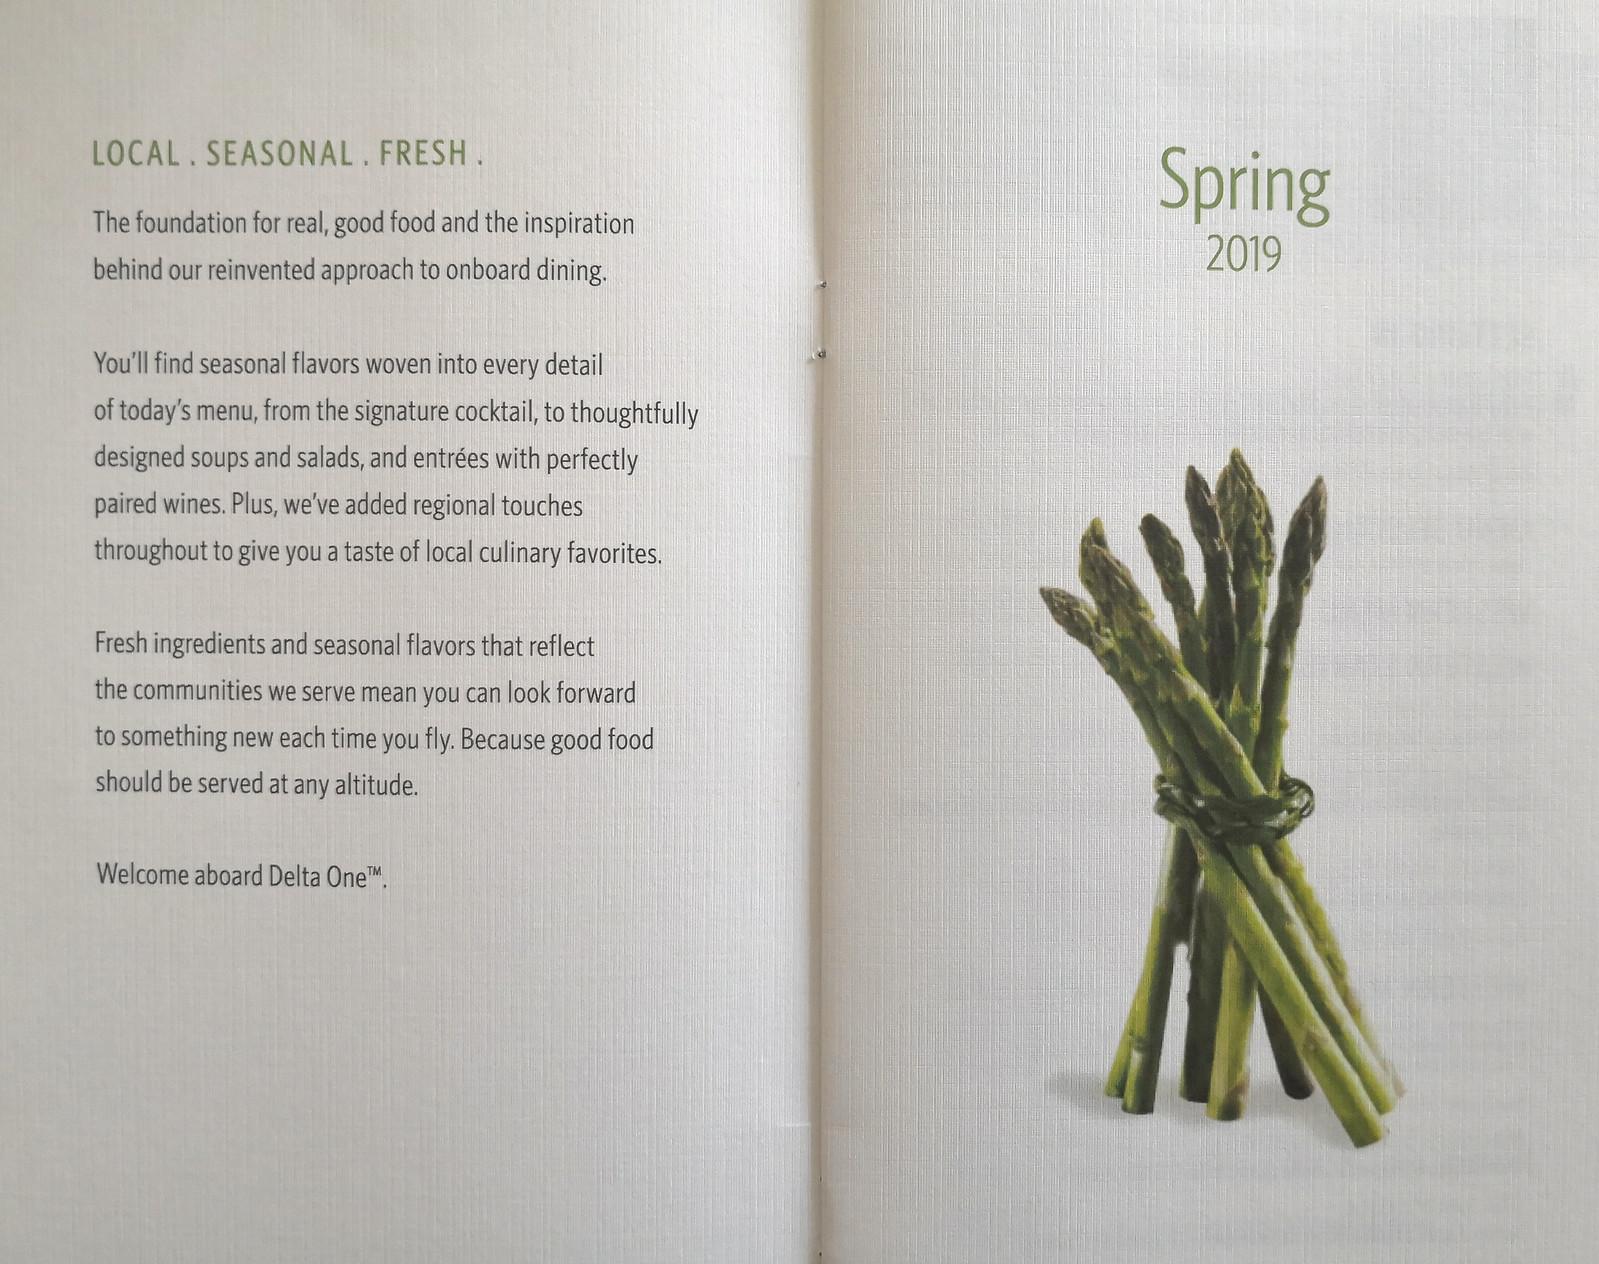 Spring 2019 menu